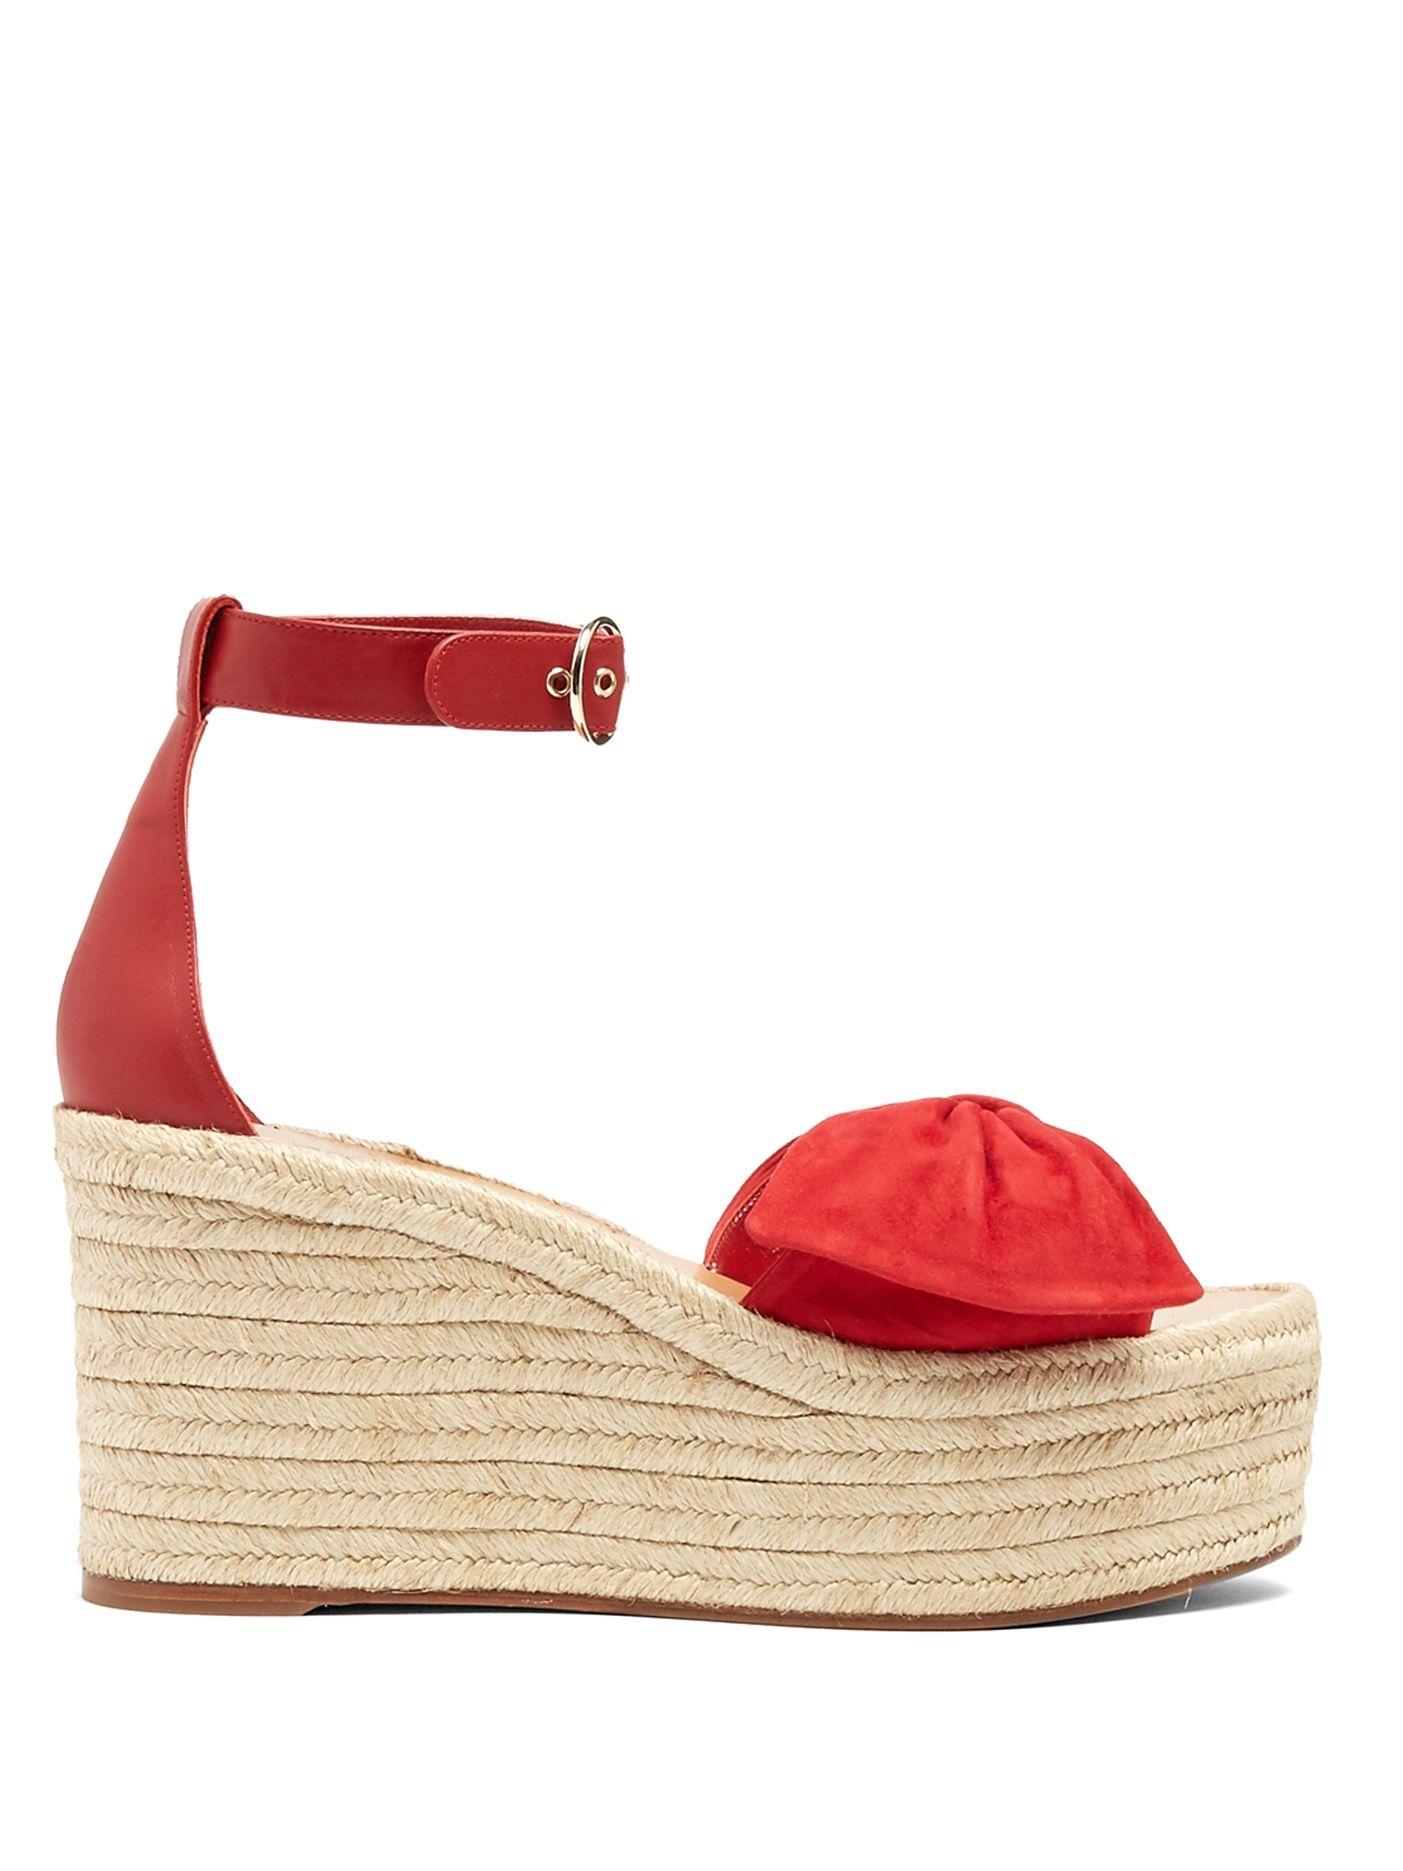 Tropical Bow suede espadrille wedge sandals | Valentino | MATCHESFASHION.COM